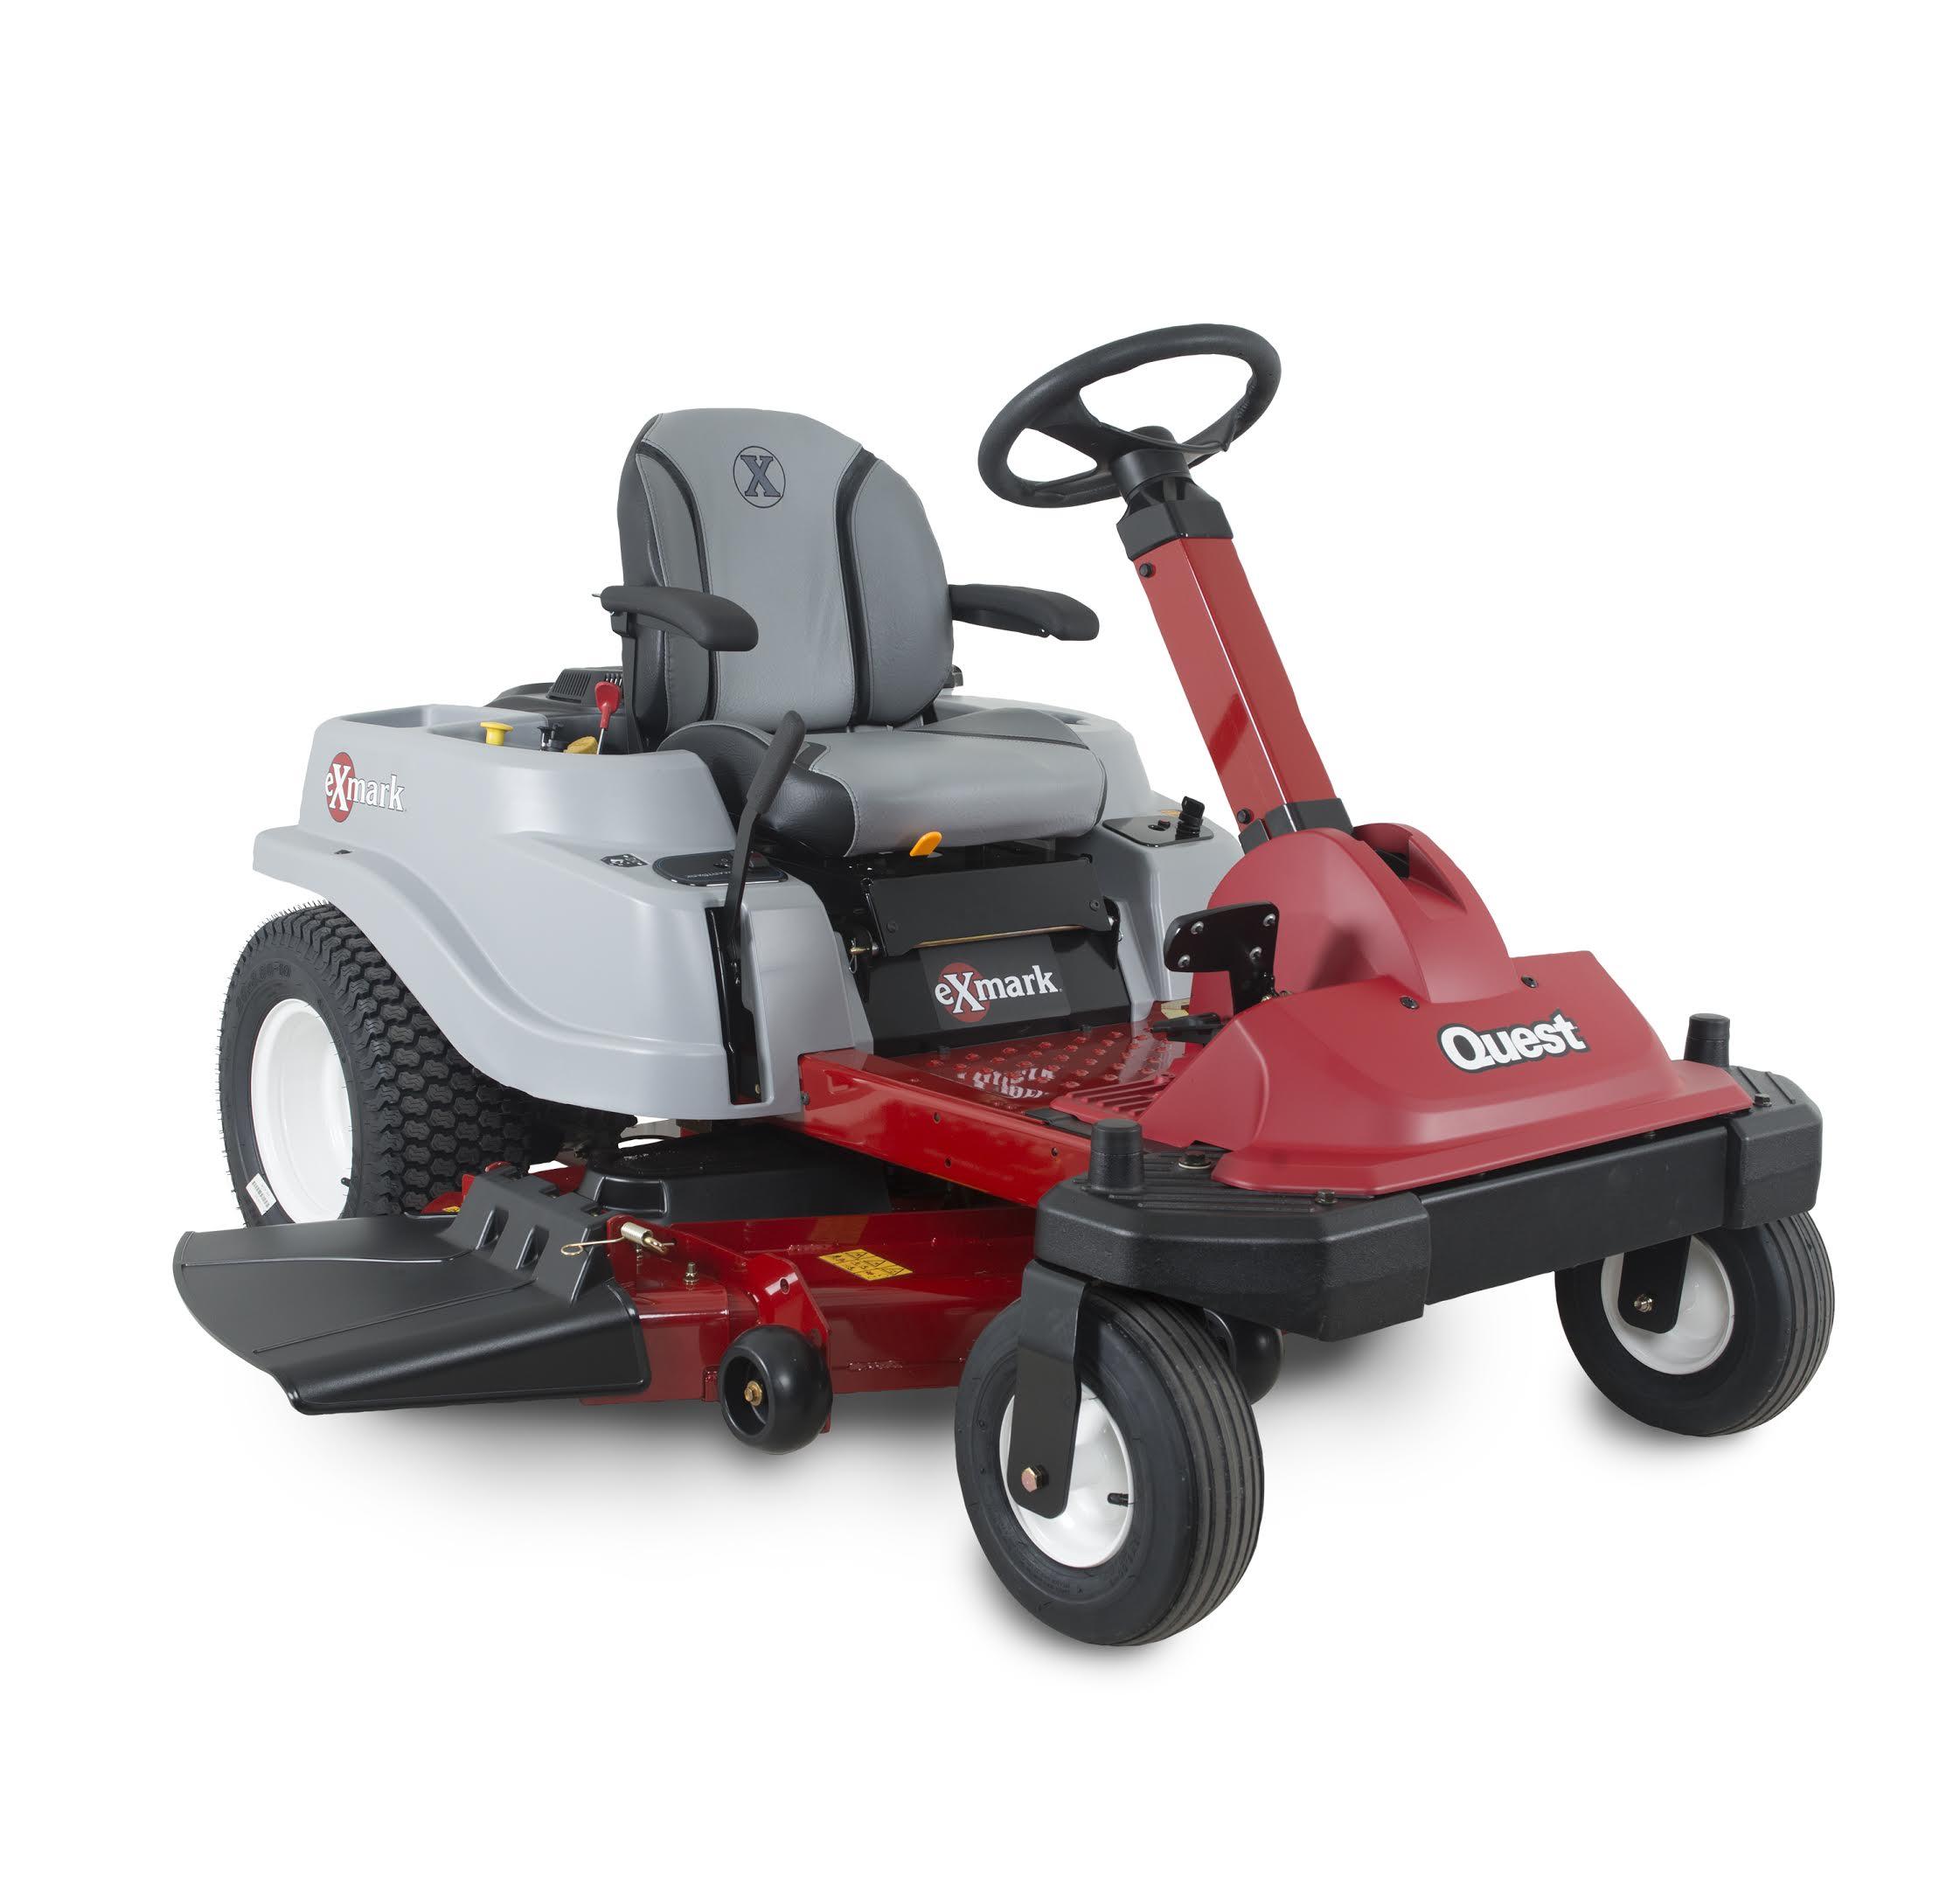 Zero Turn Garden Tractor : Riding lawn mowers zero turn minimalist pixelmari